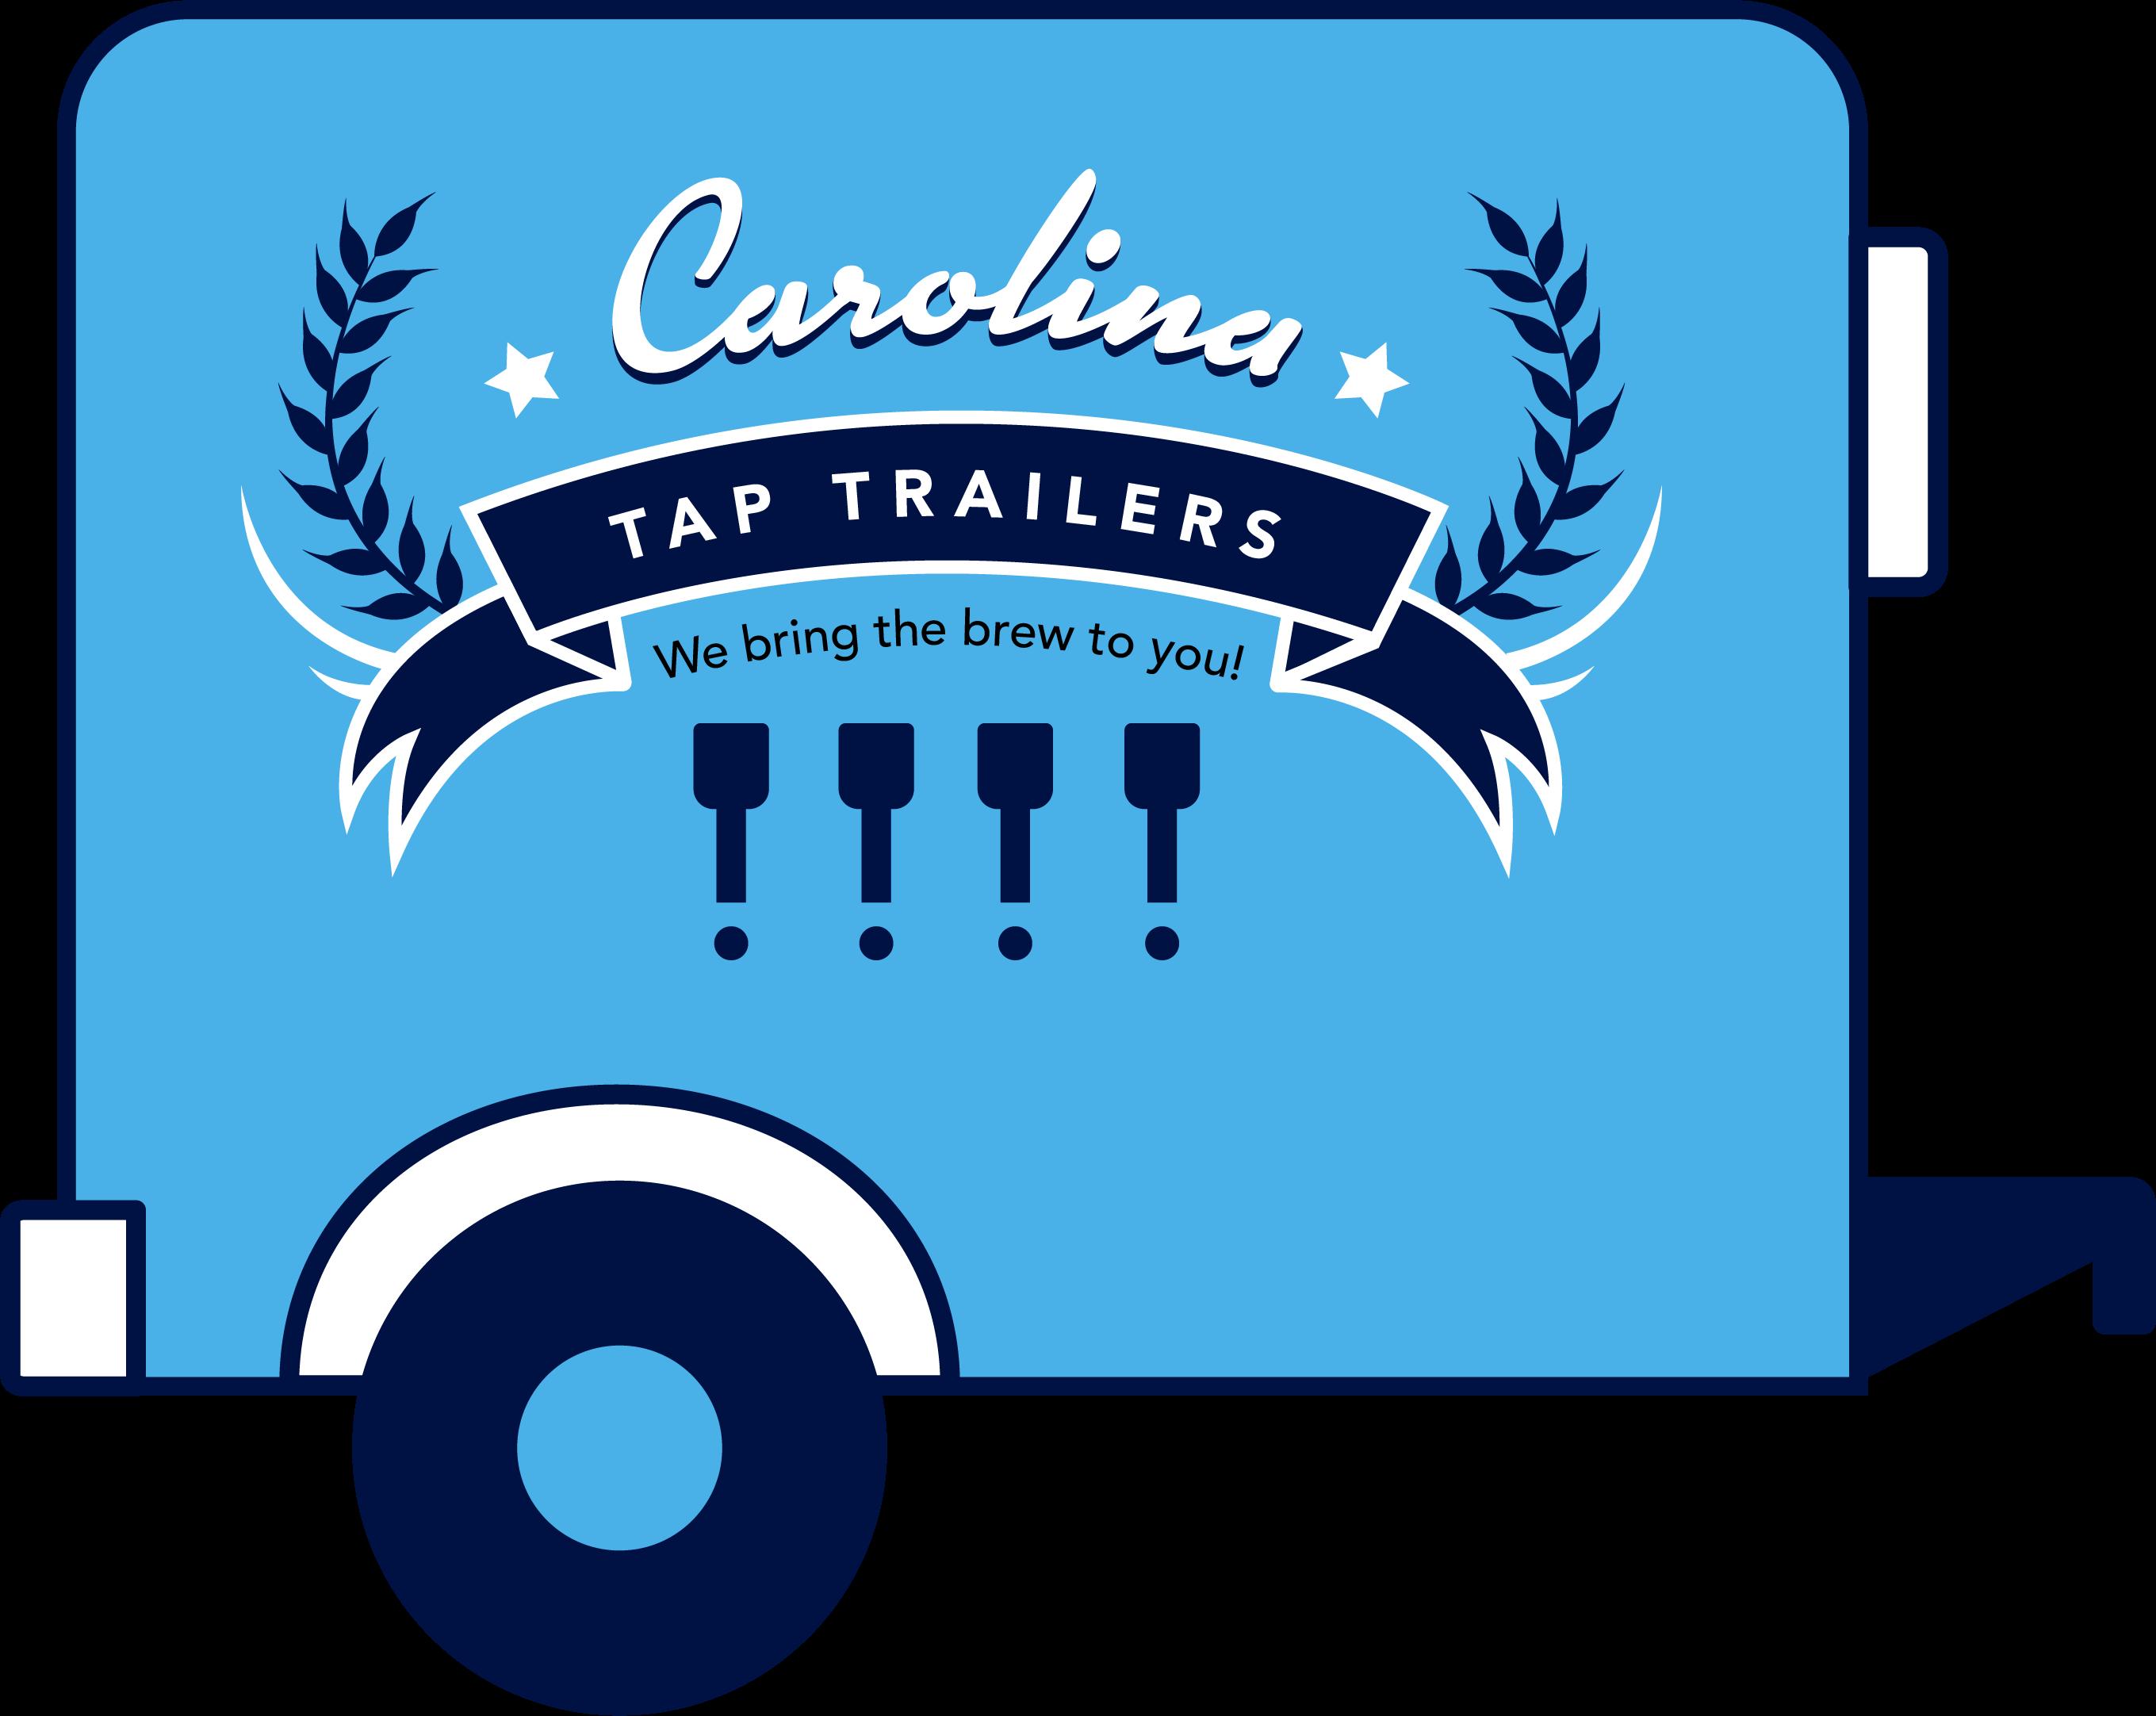 Carolina Tap Trailers